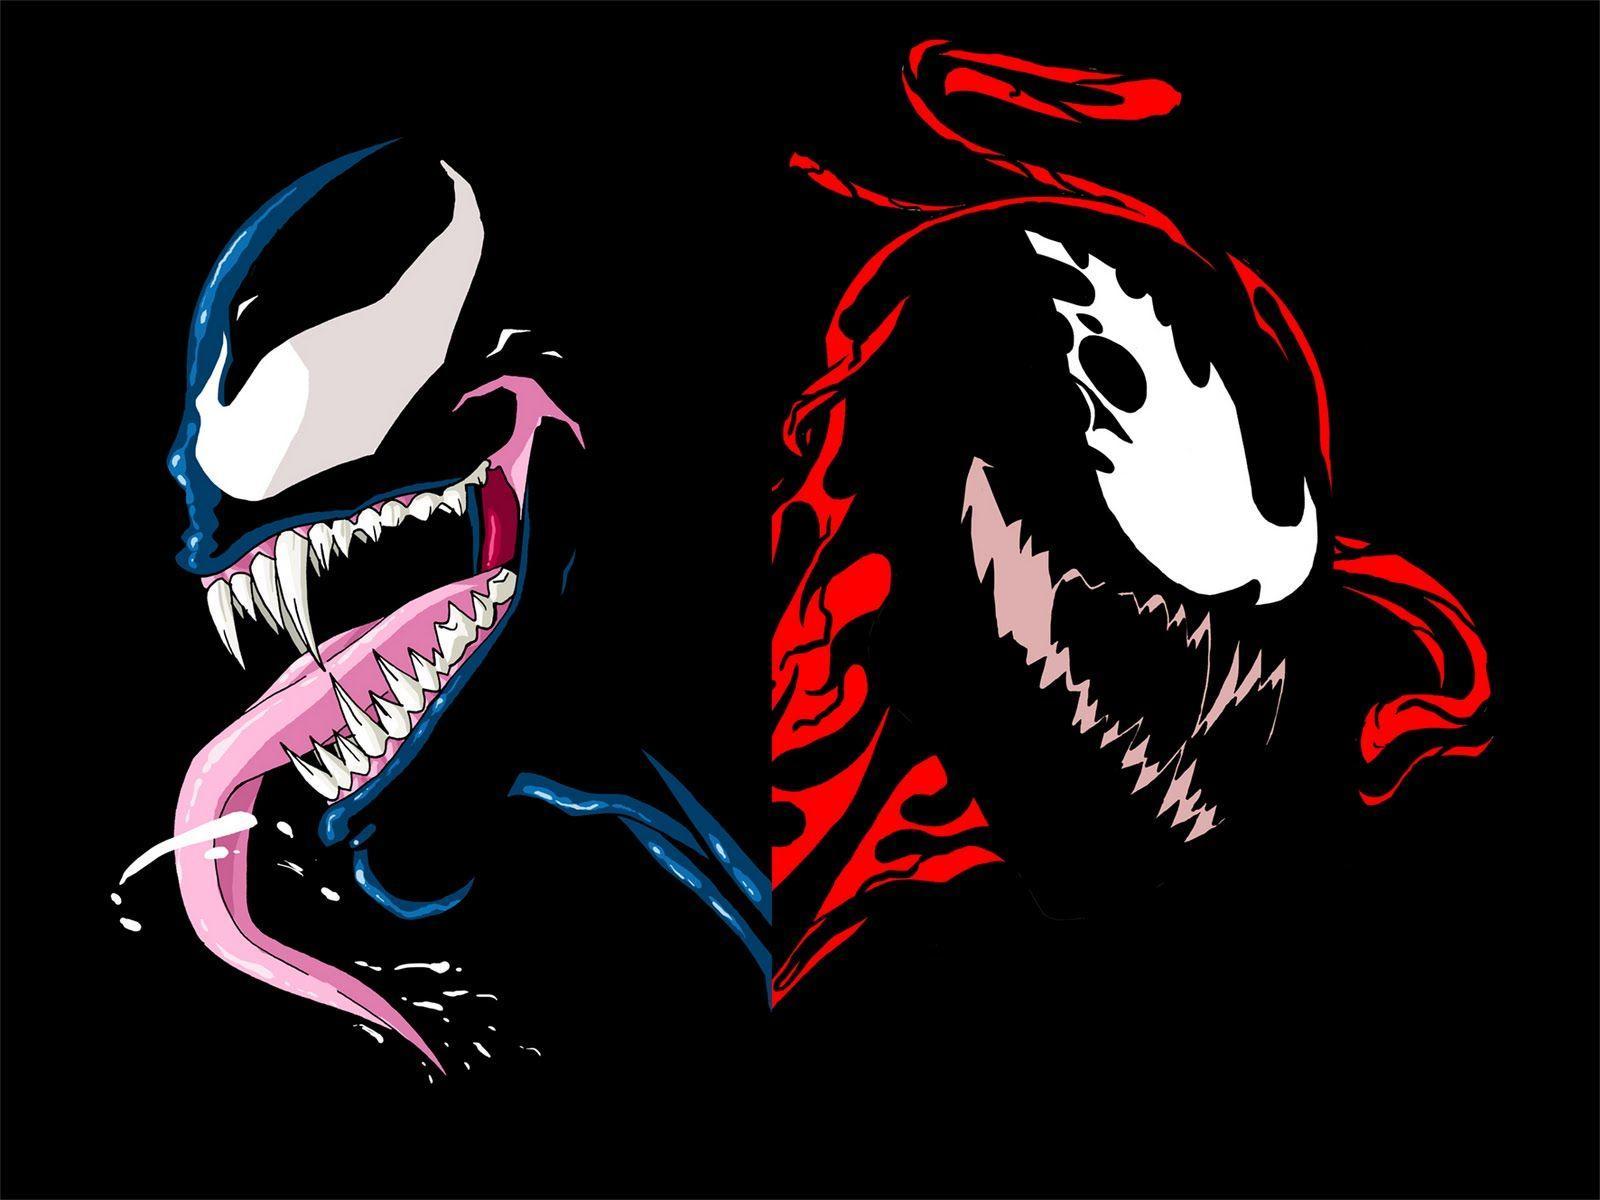 Venom Spiderman Wallpaper - WallpaperSafari